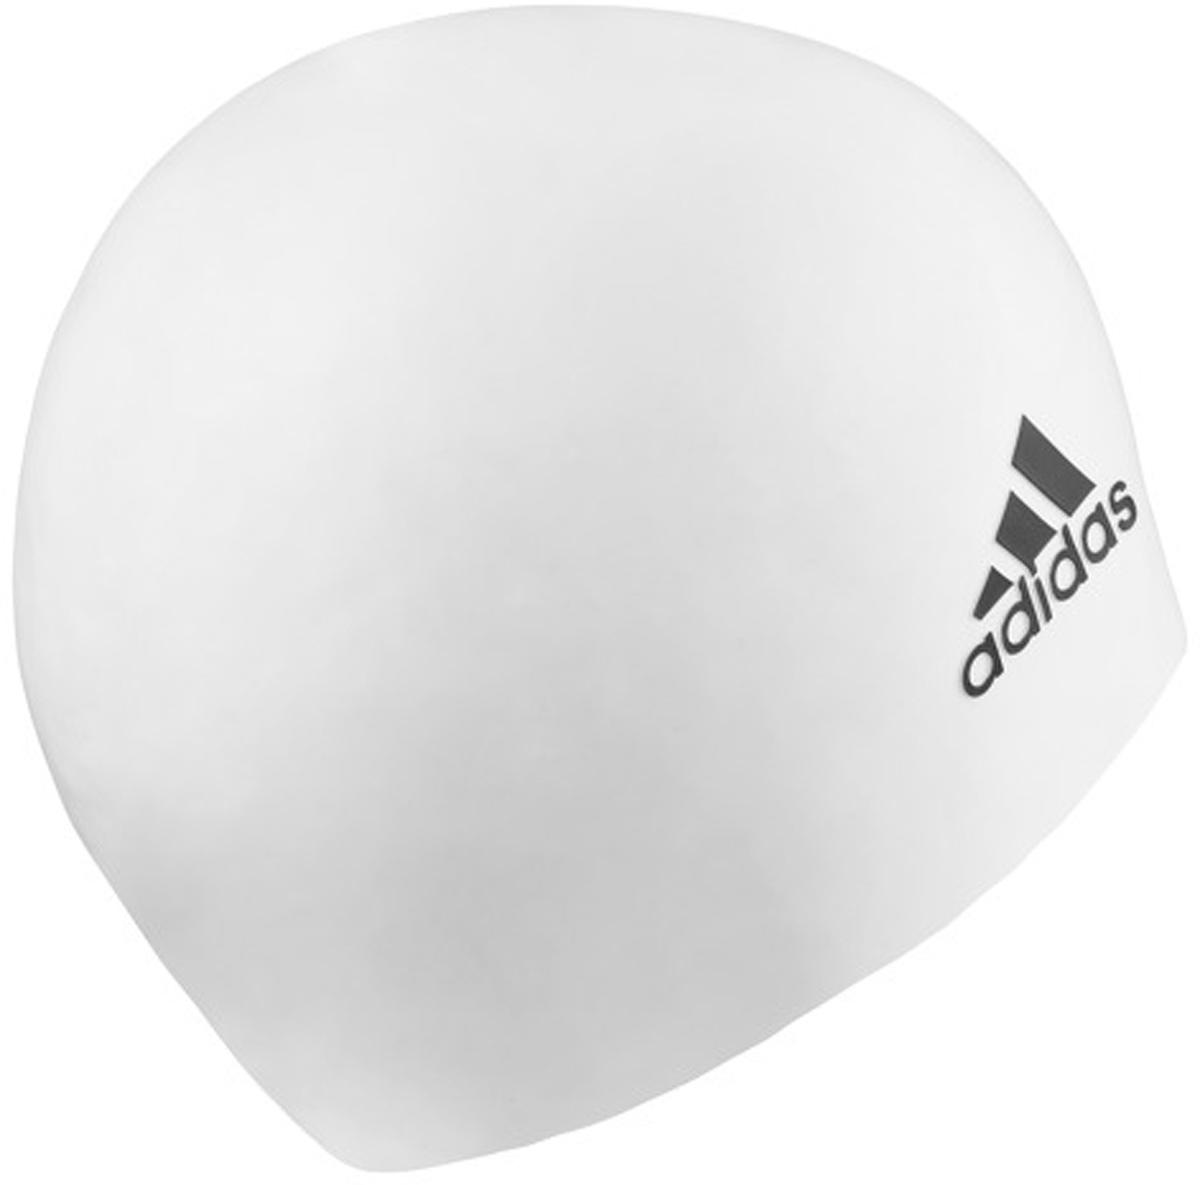 Шапочка для плавания Adidas Sil CP Logo 1PС, цвет: белый. 802315 ботинки adidas adidas ch libria pearl cp женские